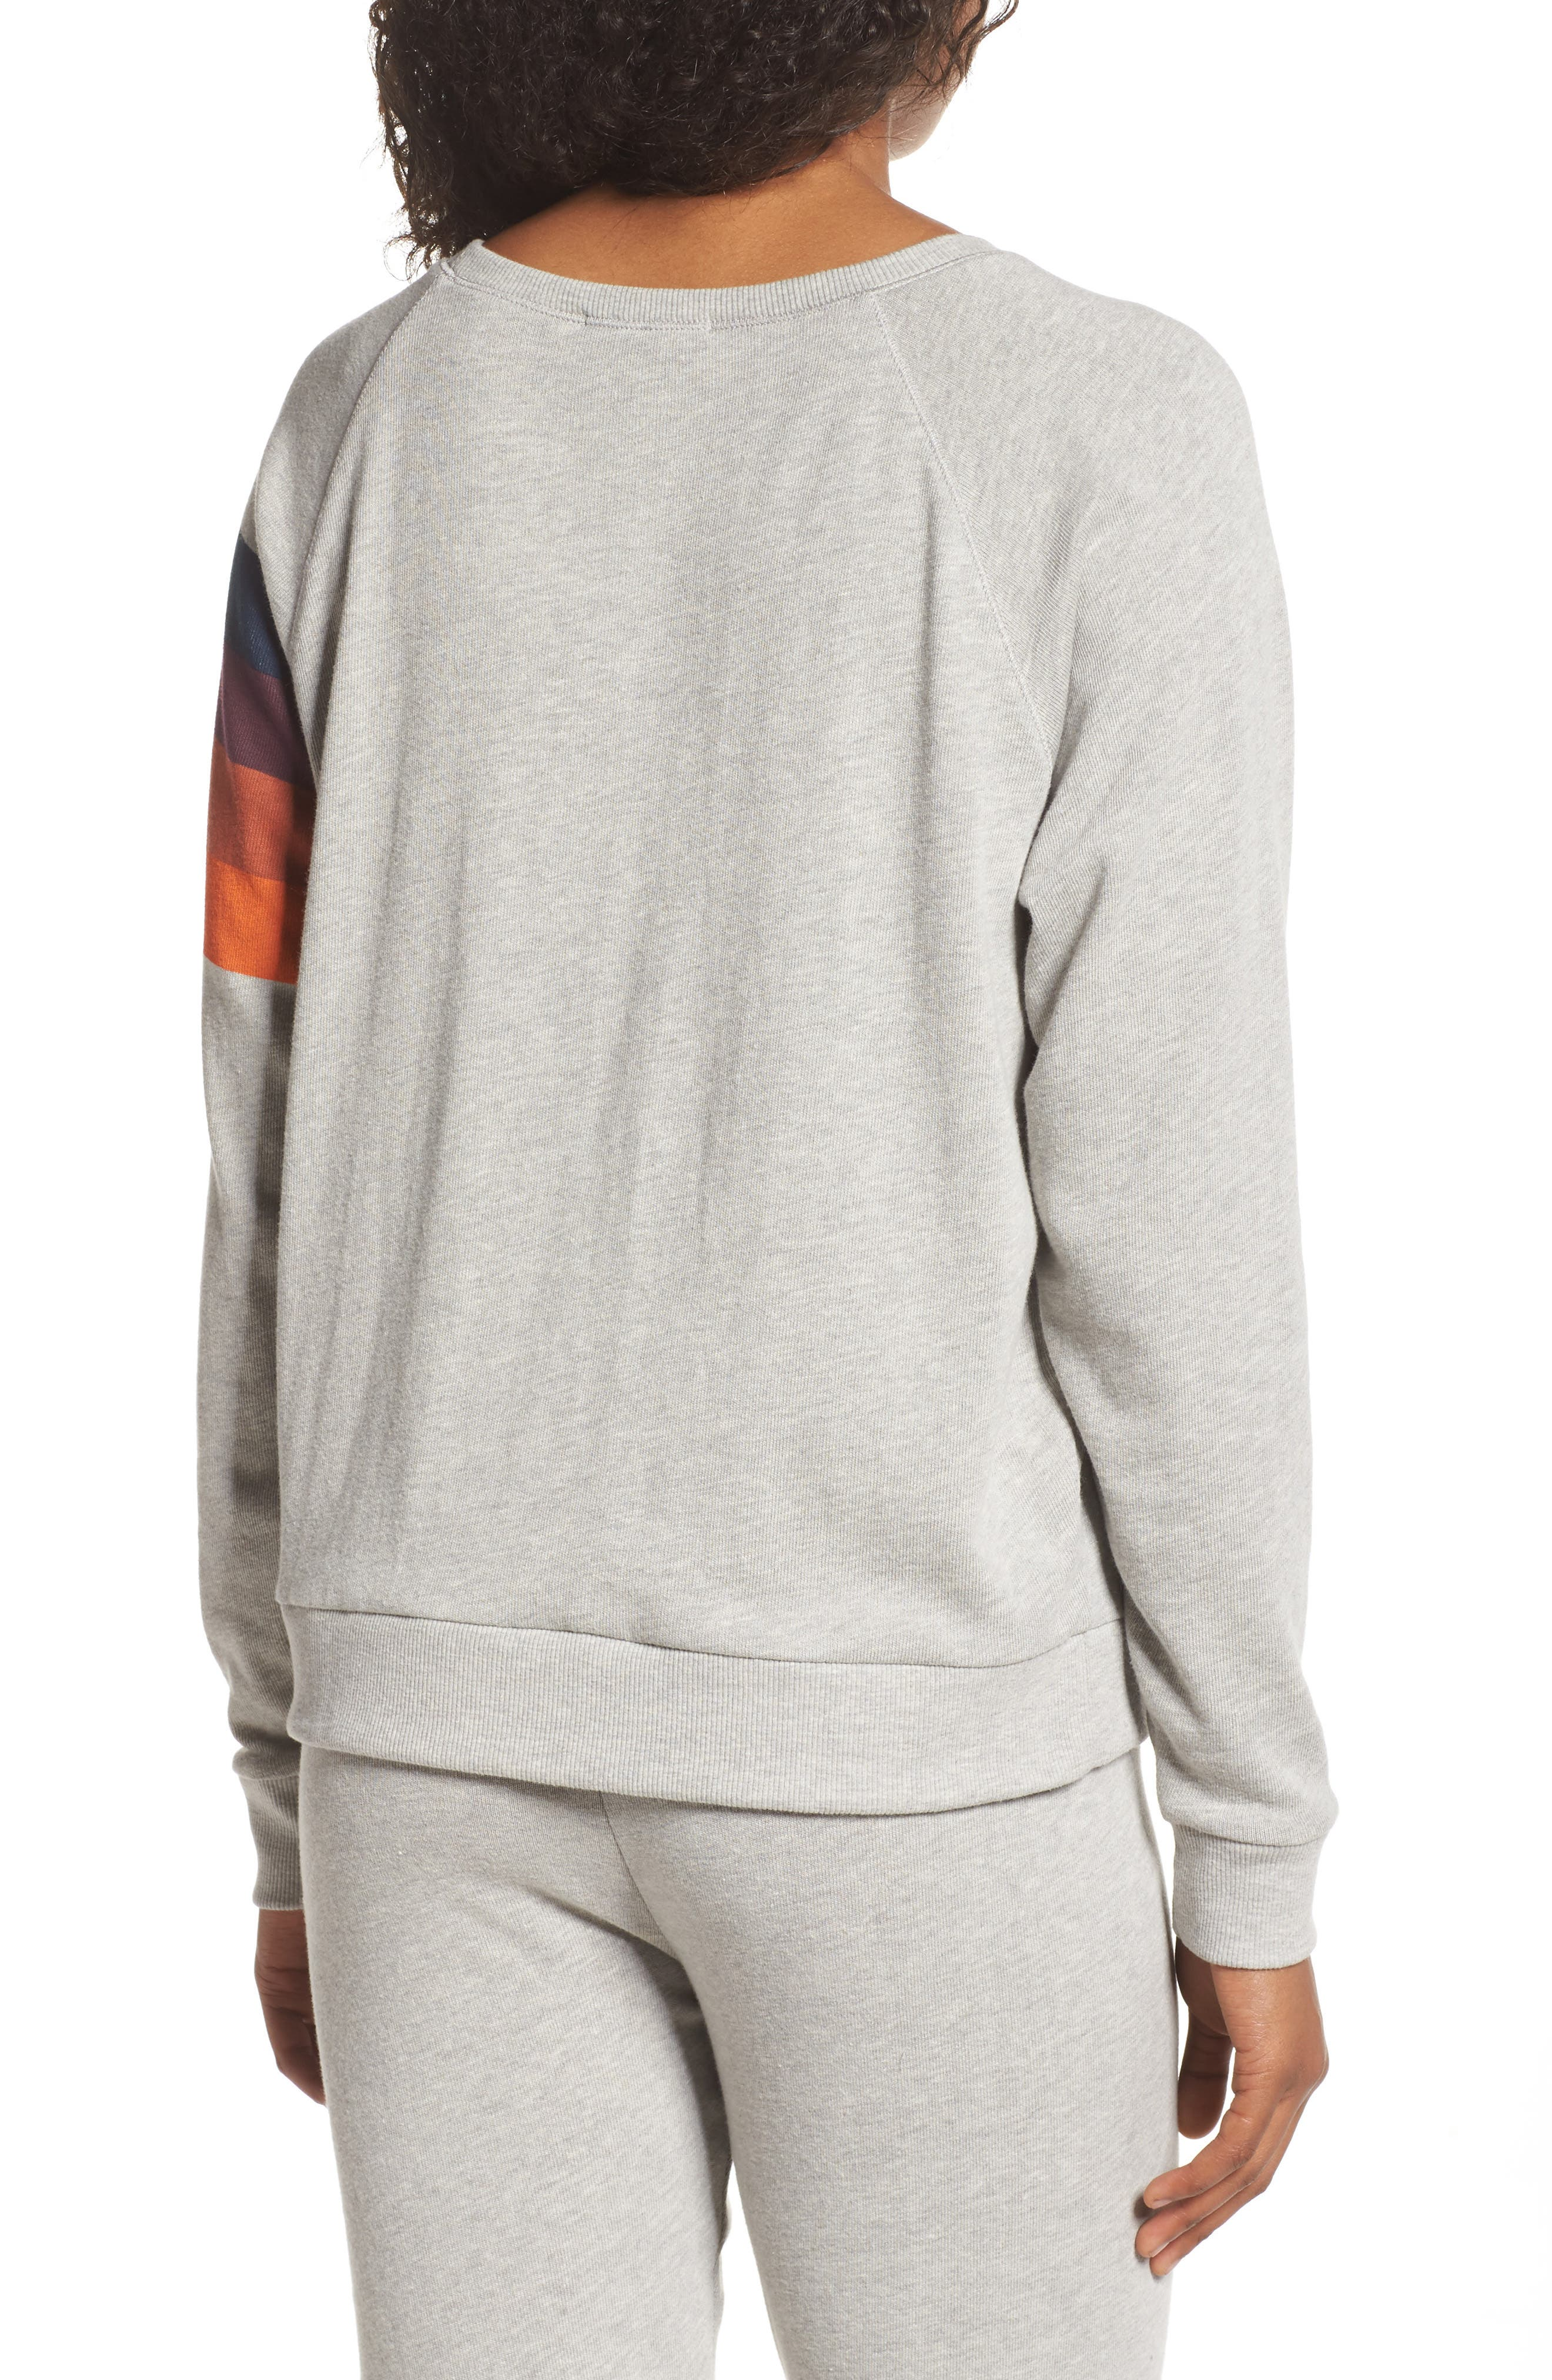 NFL Denver Broncos Hacci Sweatshirt,                             Alternate thumbnail 2, color,                             Dove Heather Grey